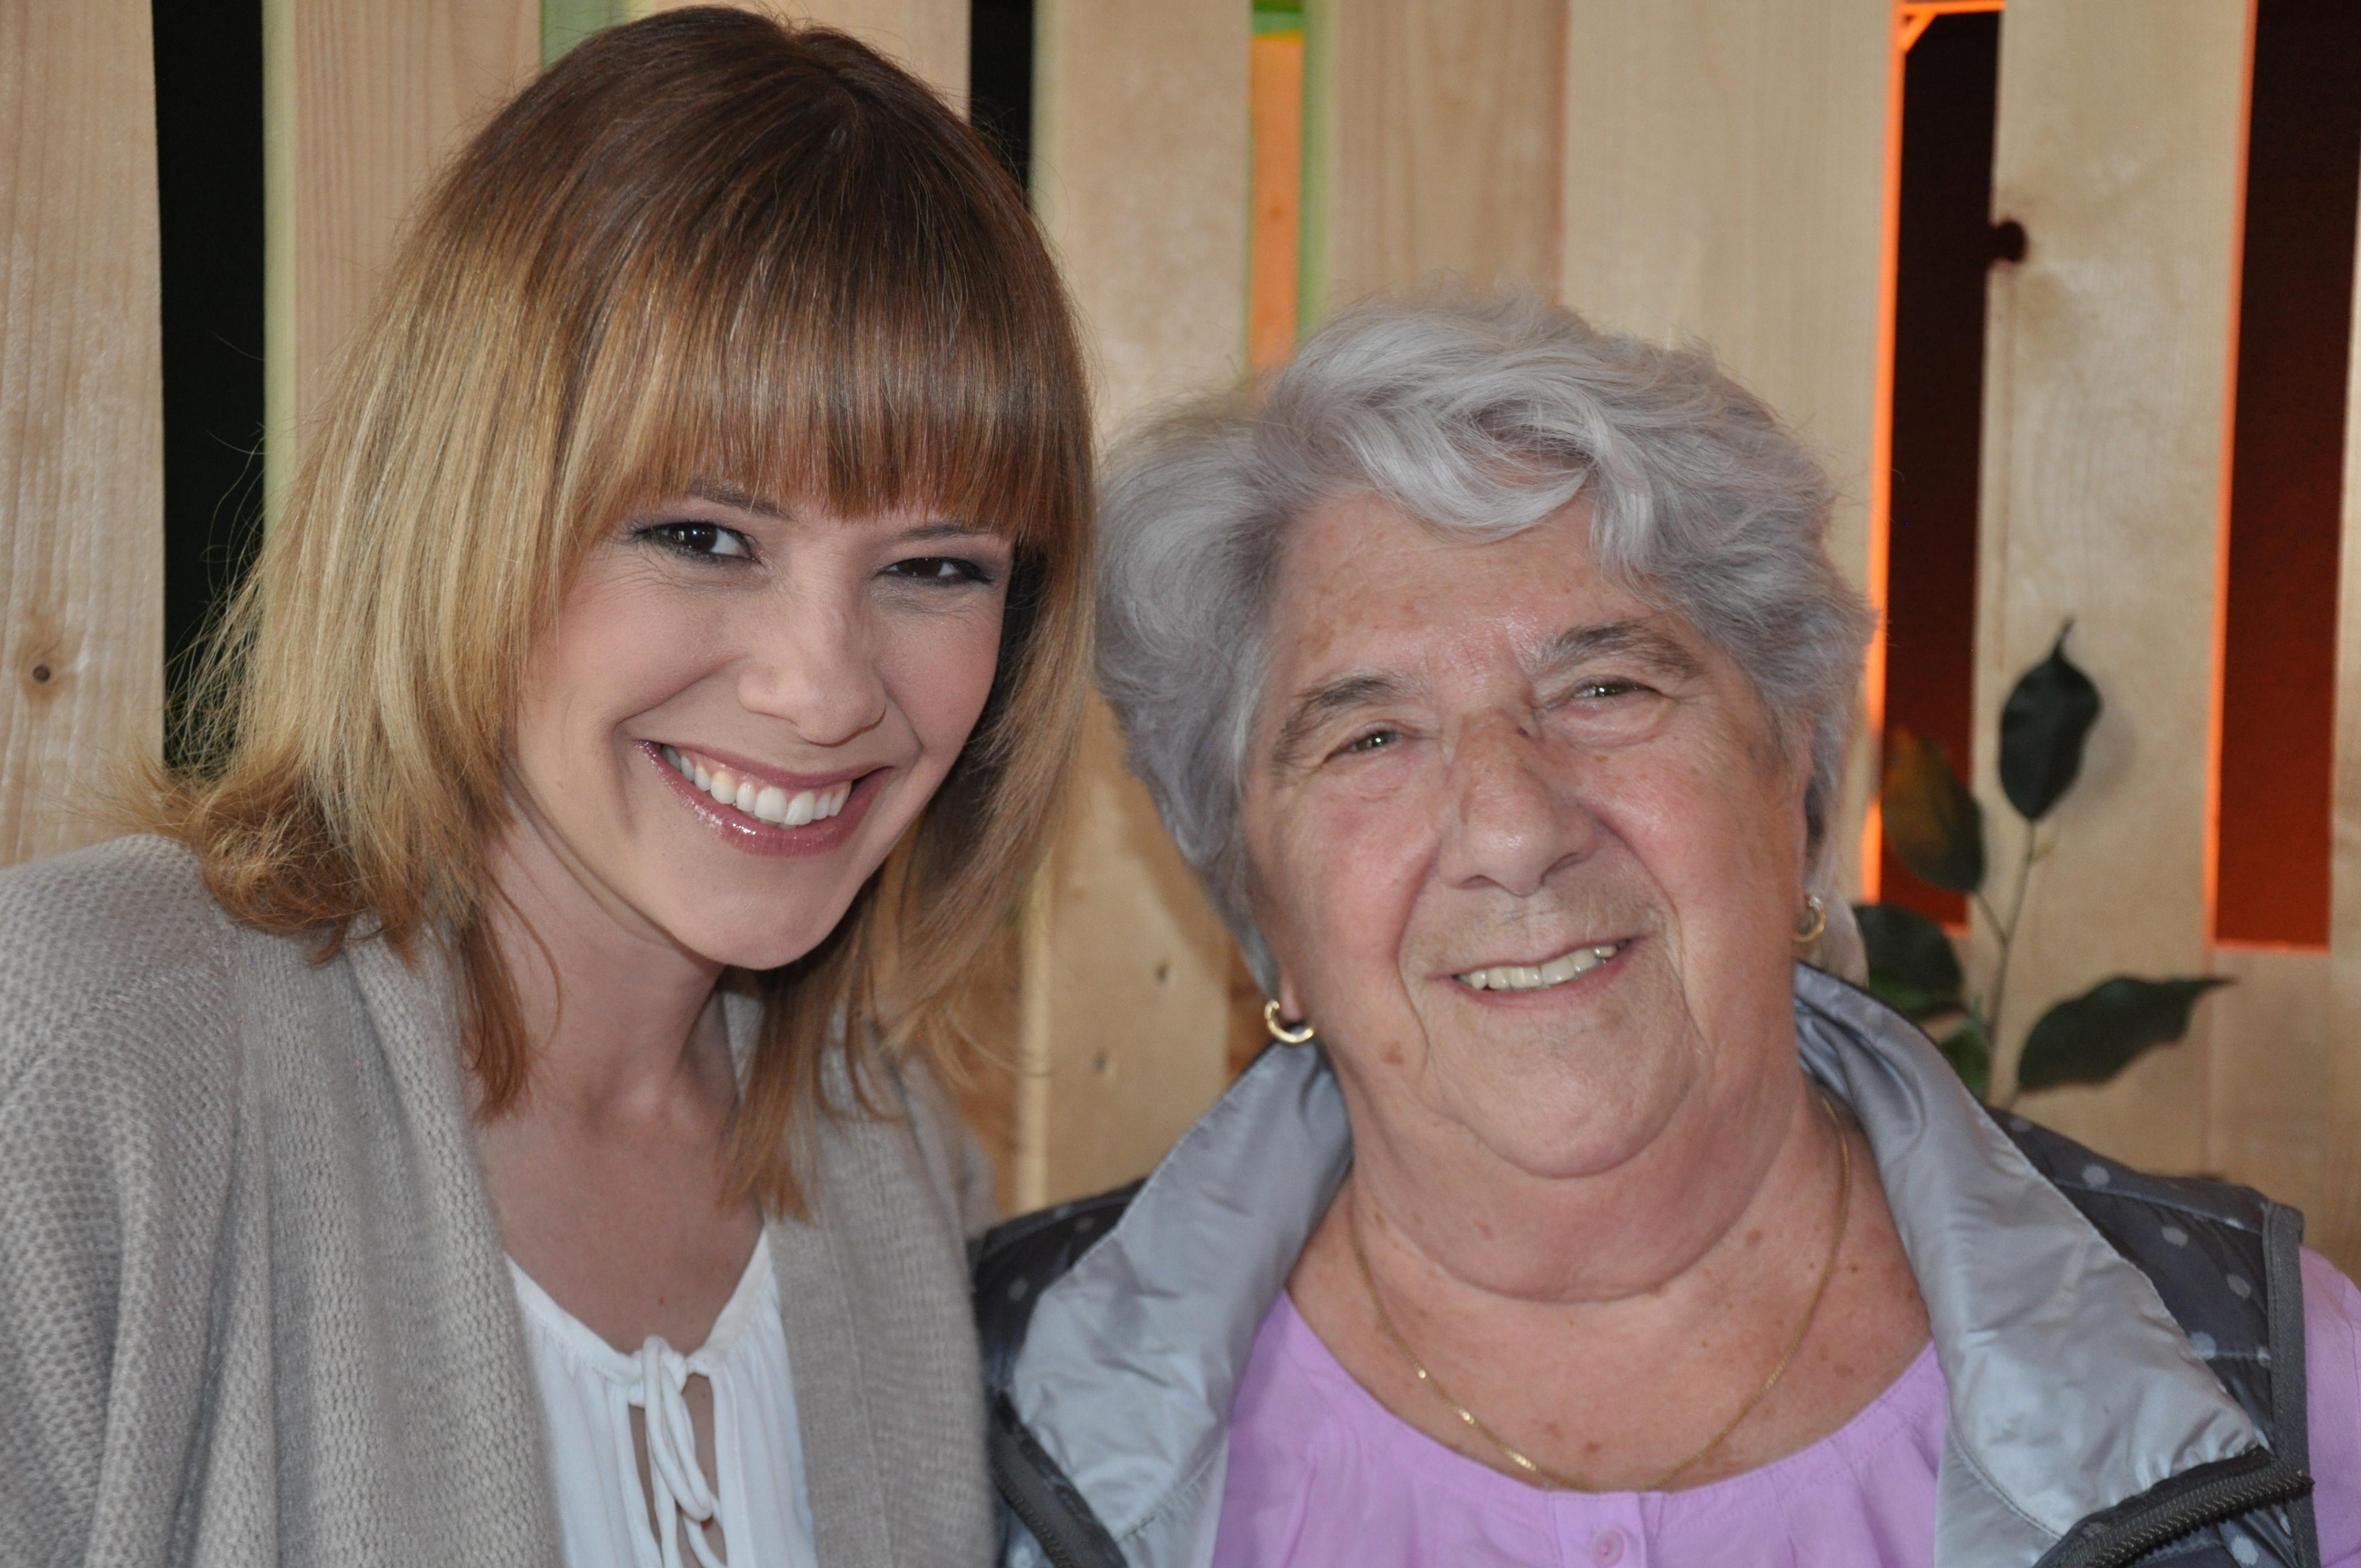 Senioren-Muttertag: Privates Fotoshooting mit Seniorin